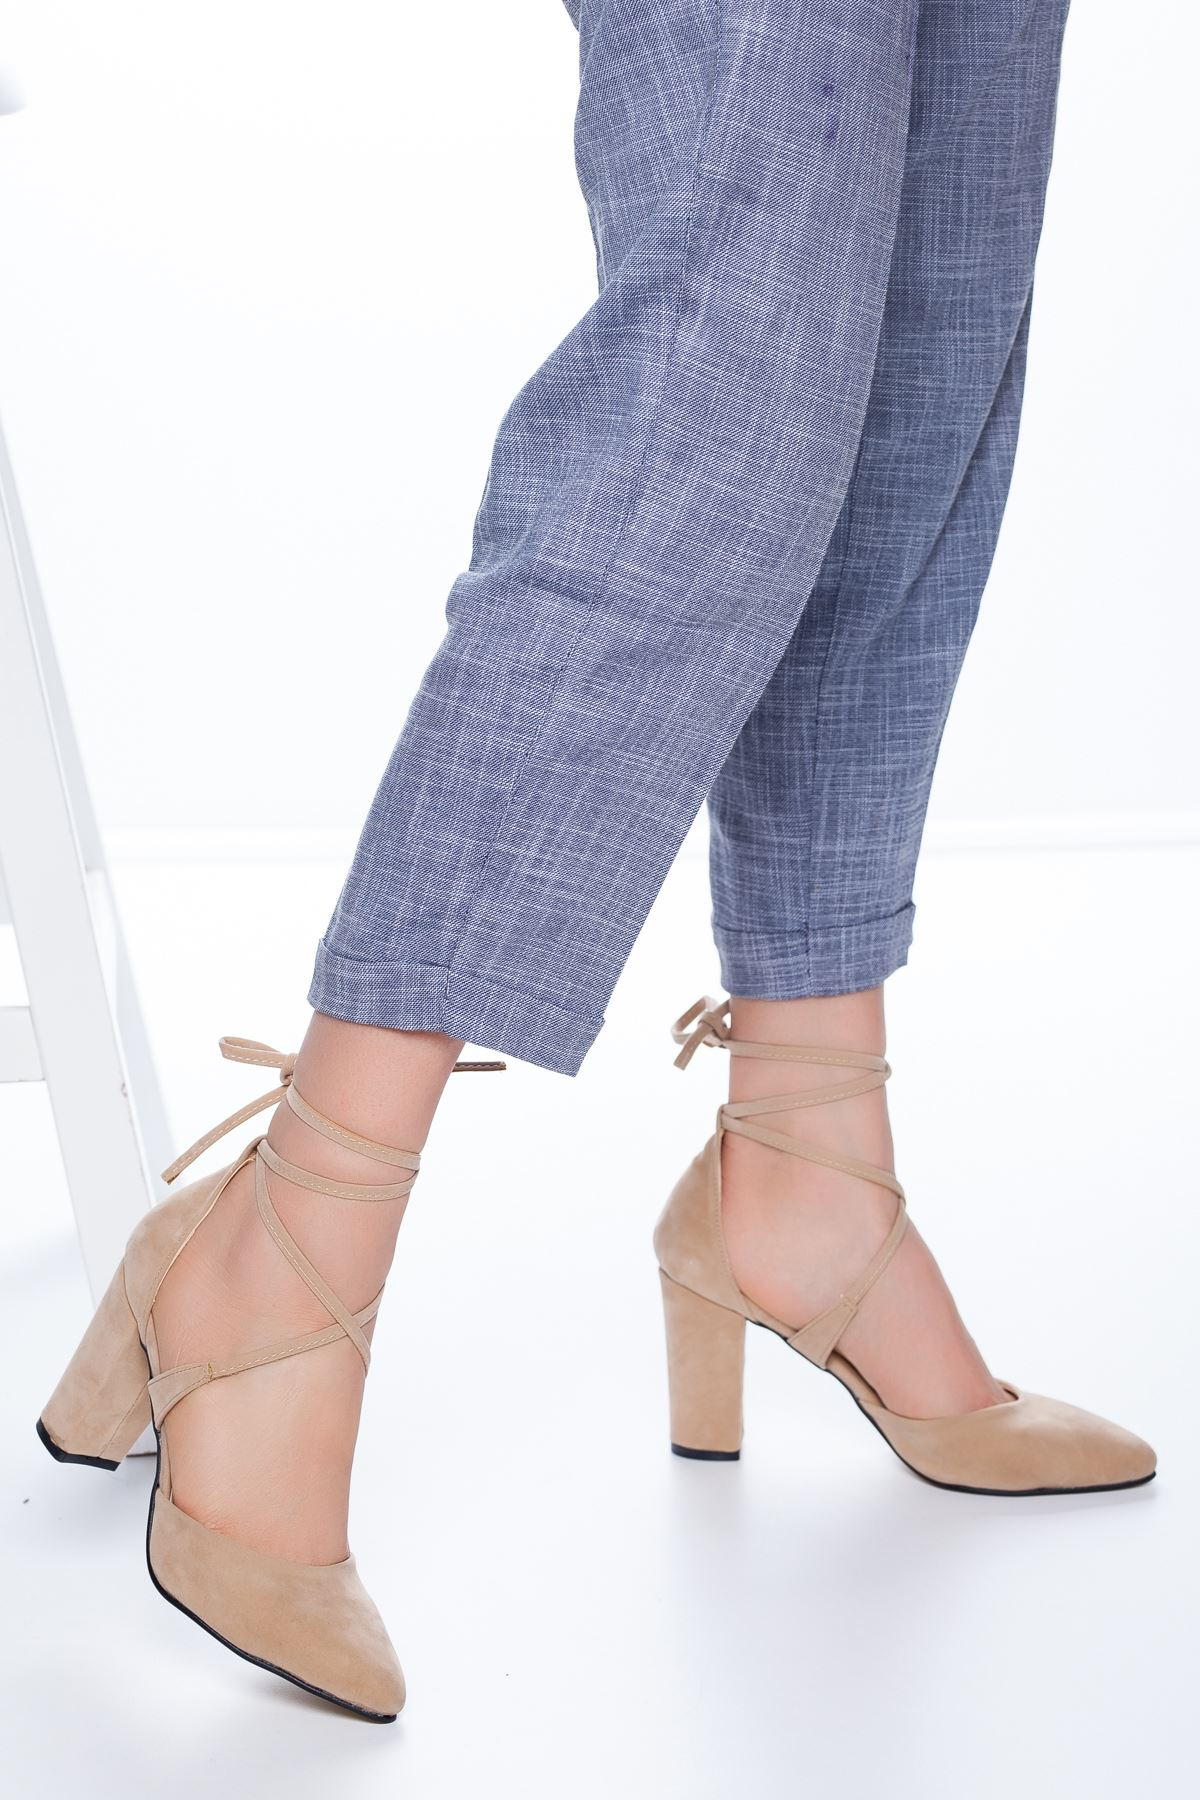 Femilla Topuklu Süet Ayakkabı Ten